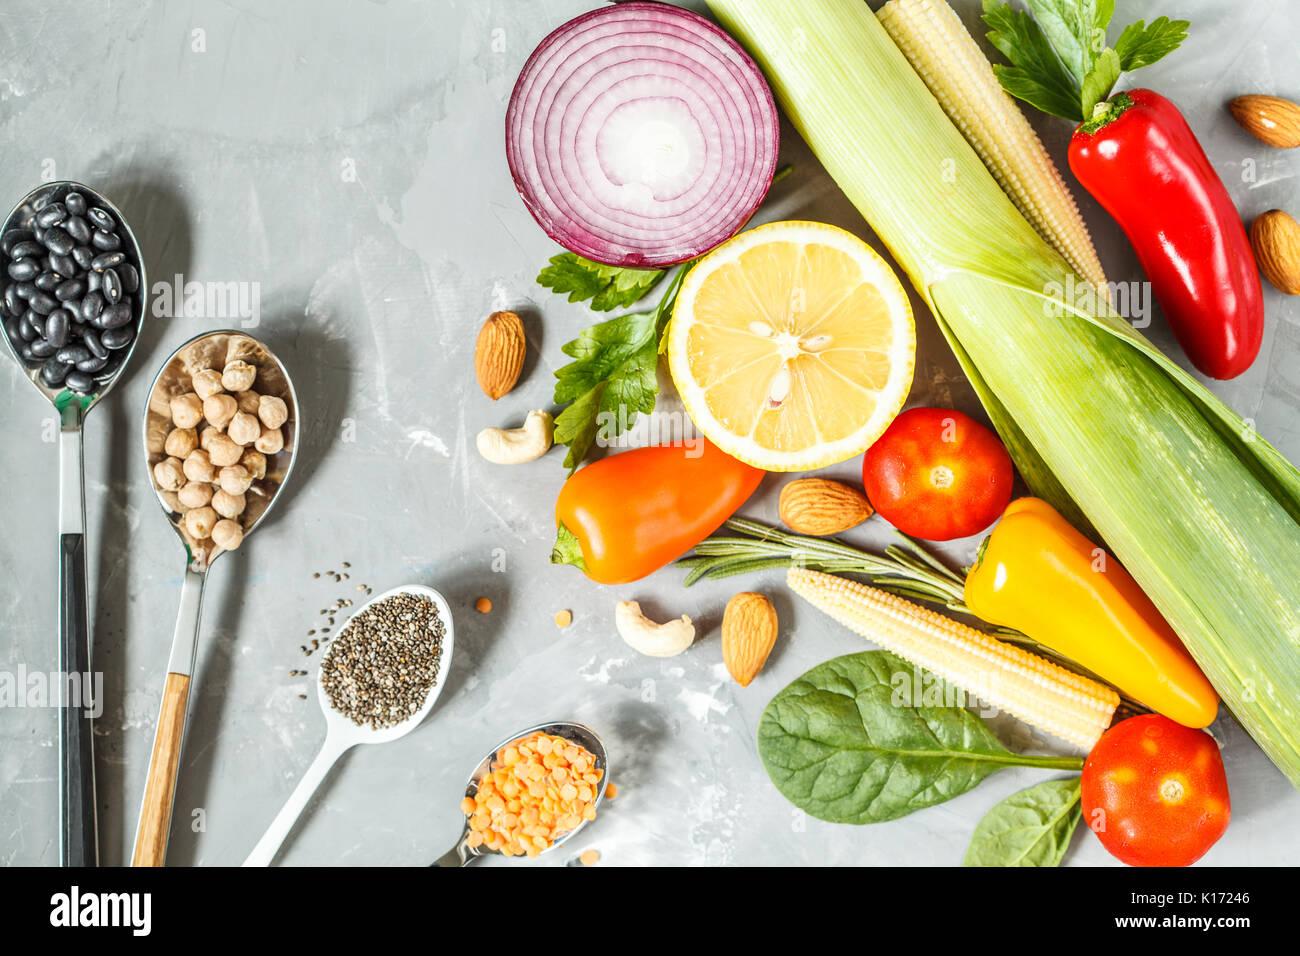 Vegan background. Ingredients for a vegetarian diet. tofu, grains and vegetables. - Stock Image